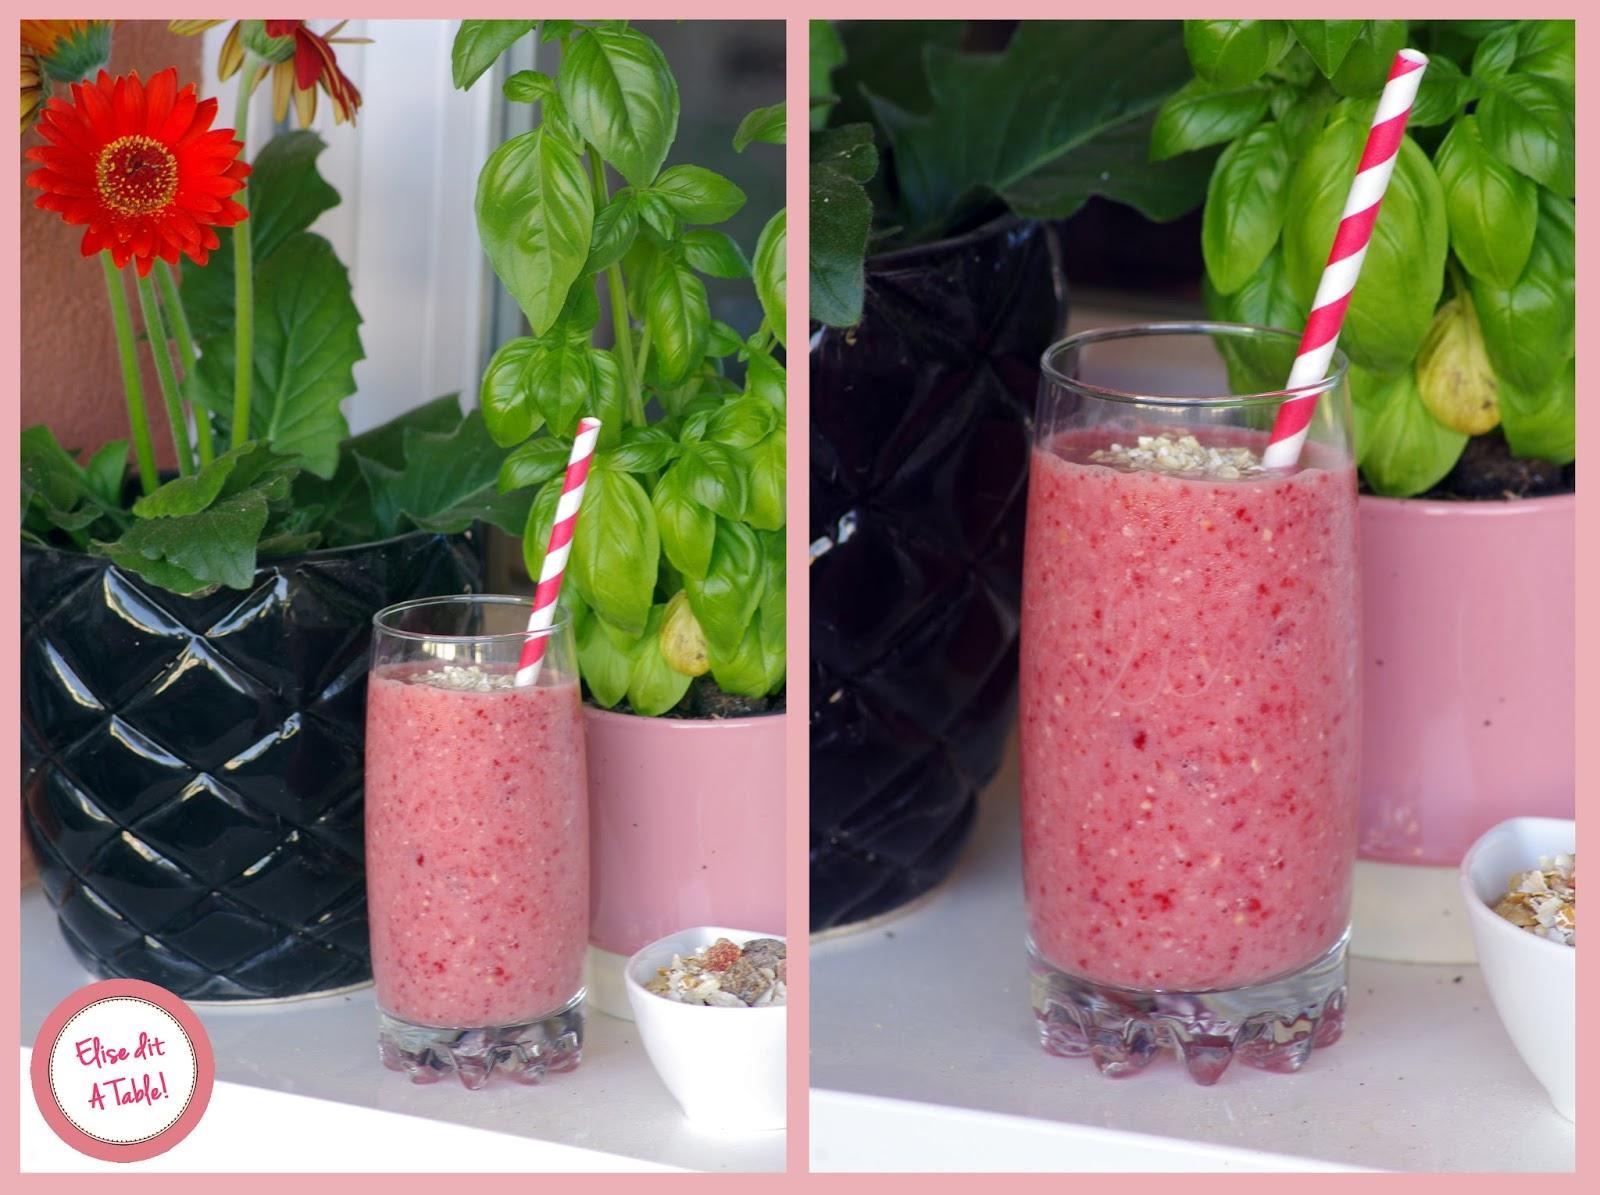 recette smoothie fraise et avoine blog cuisine. Black Bedroom Furniture Sets. Home Design Ideas